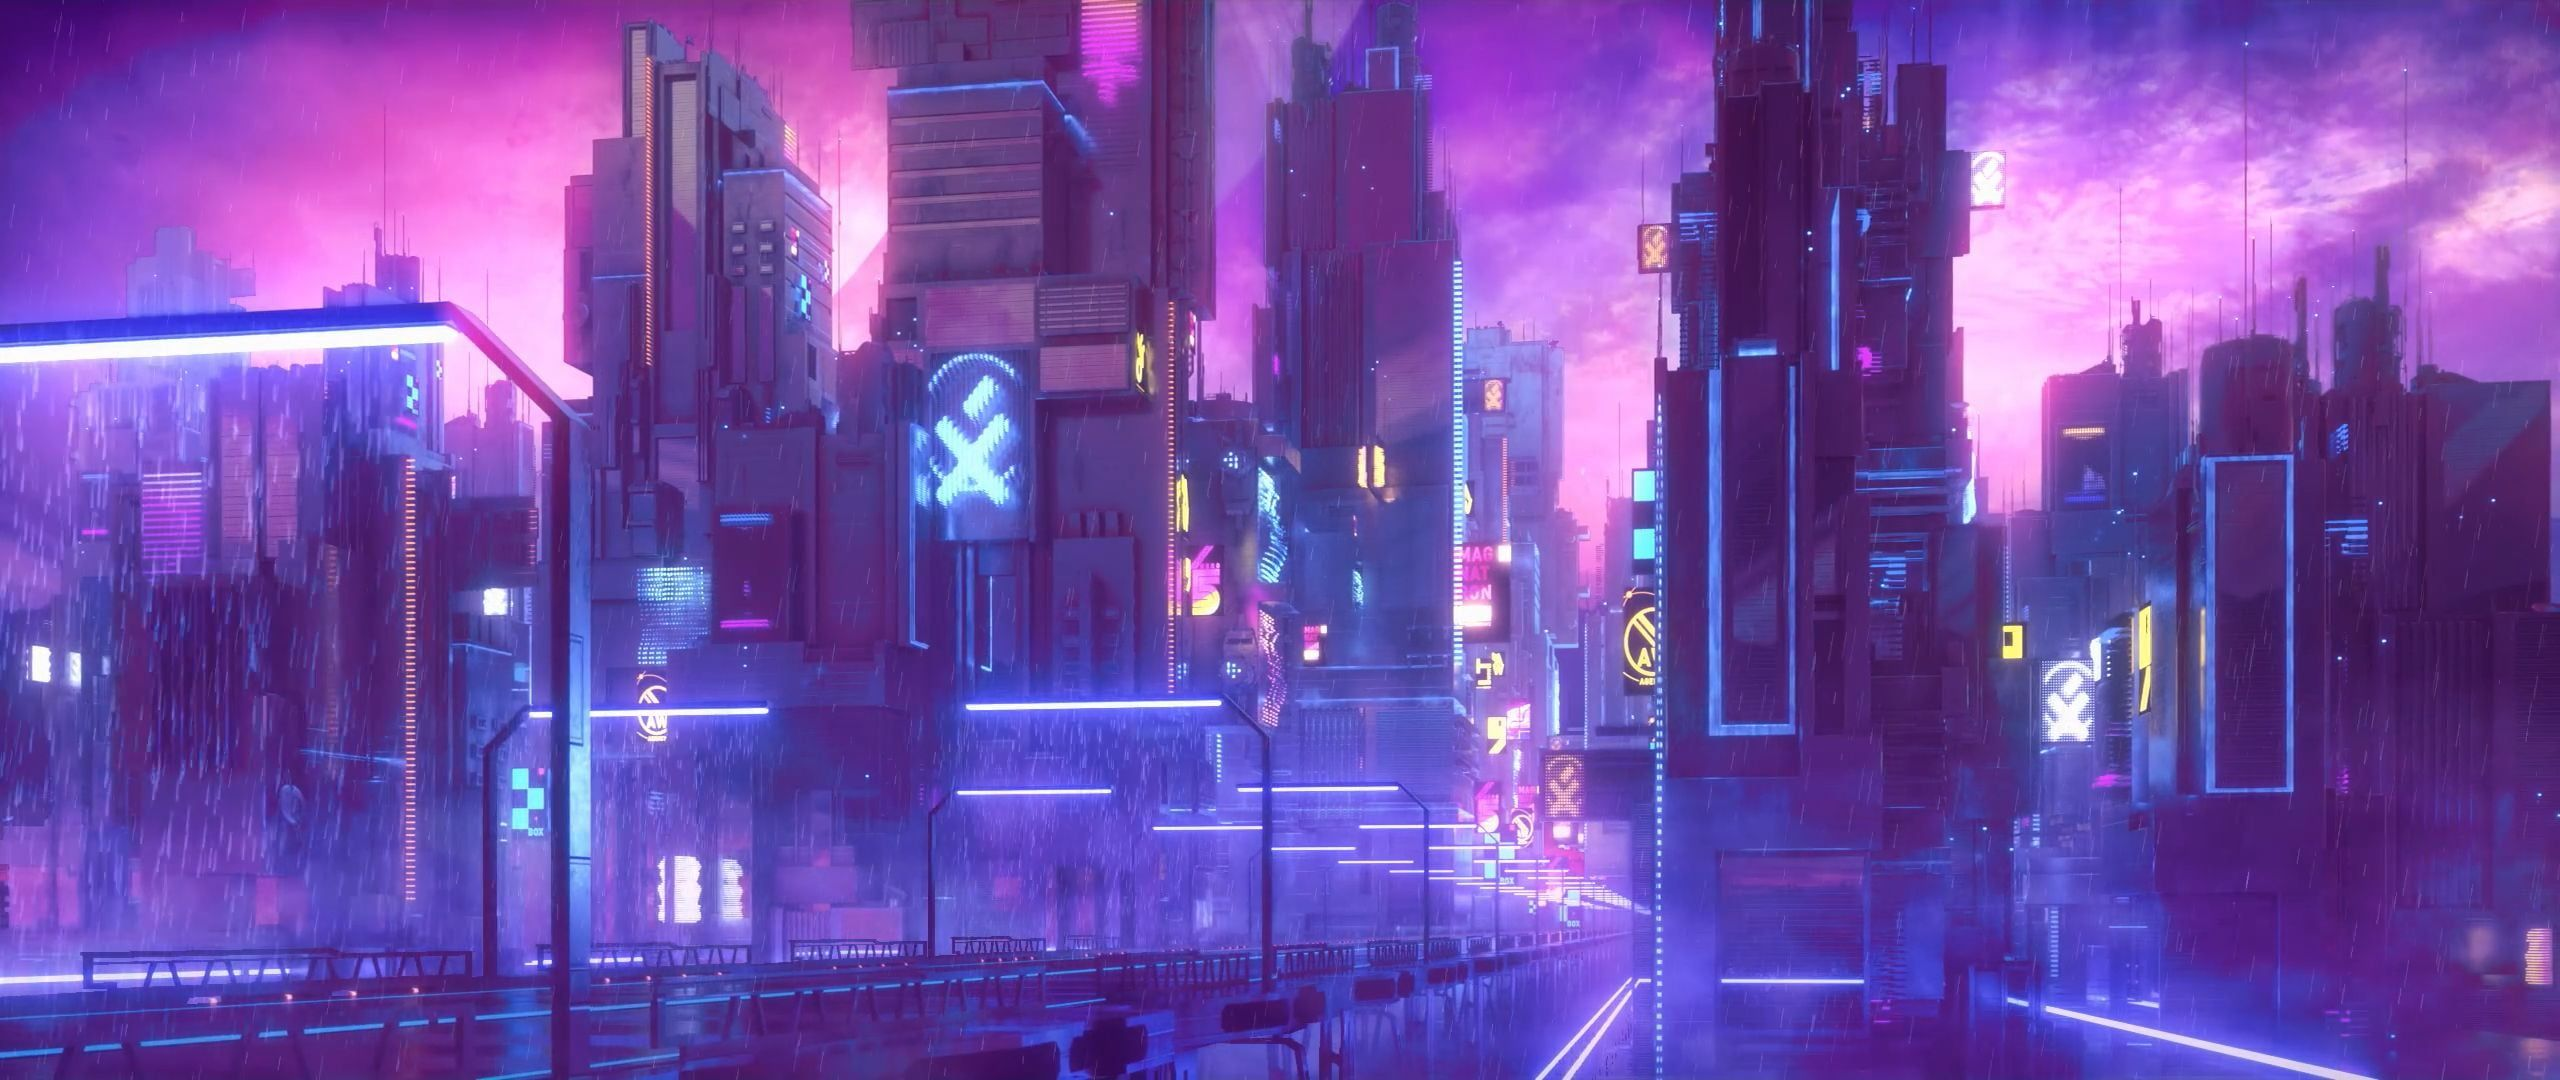 City Animated Digital Wallpaper Cyberpunk Neon 2k Wallpaper